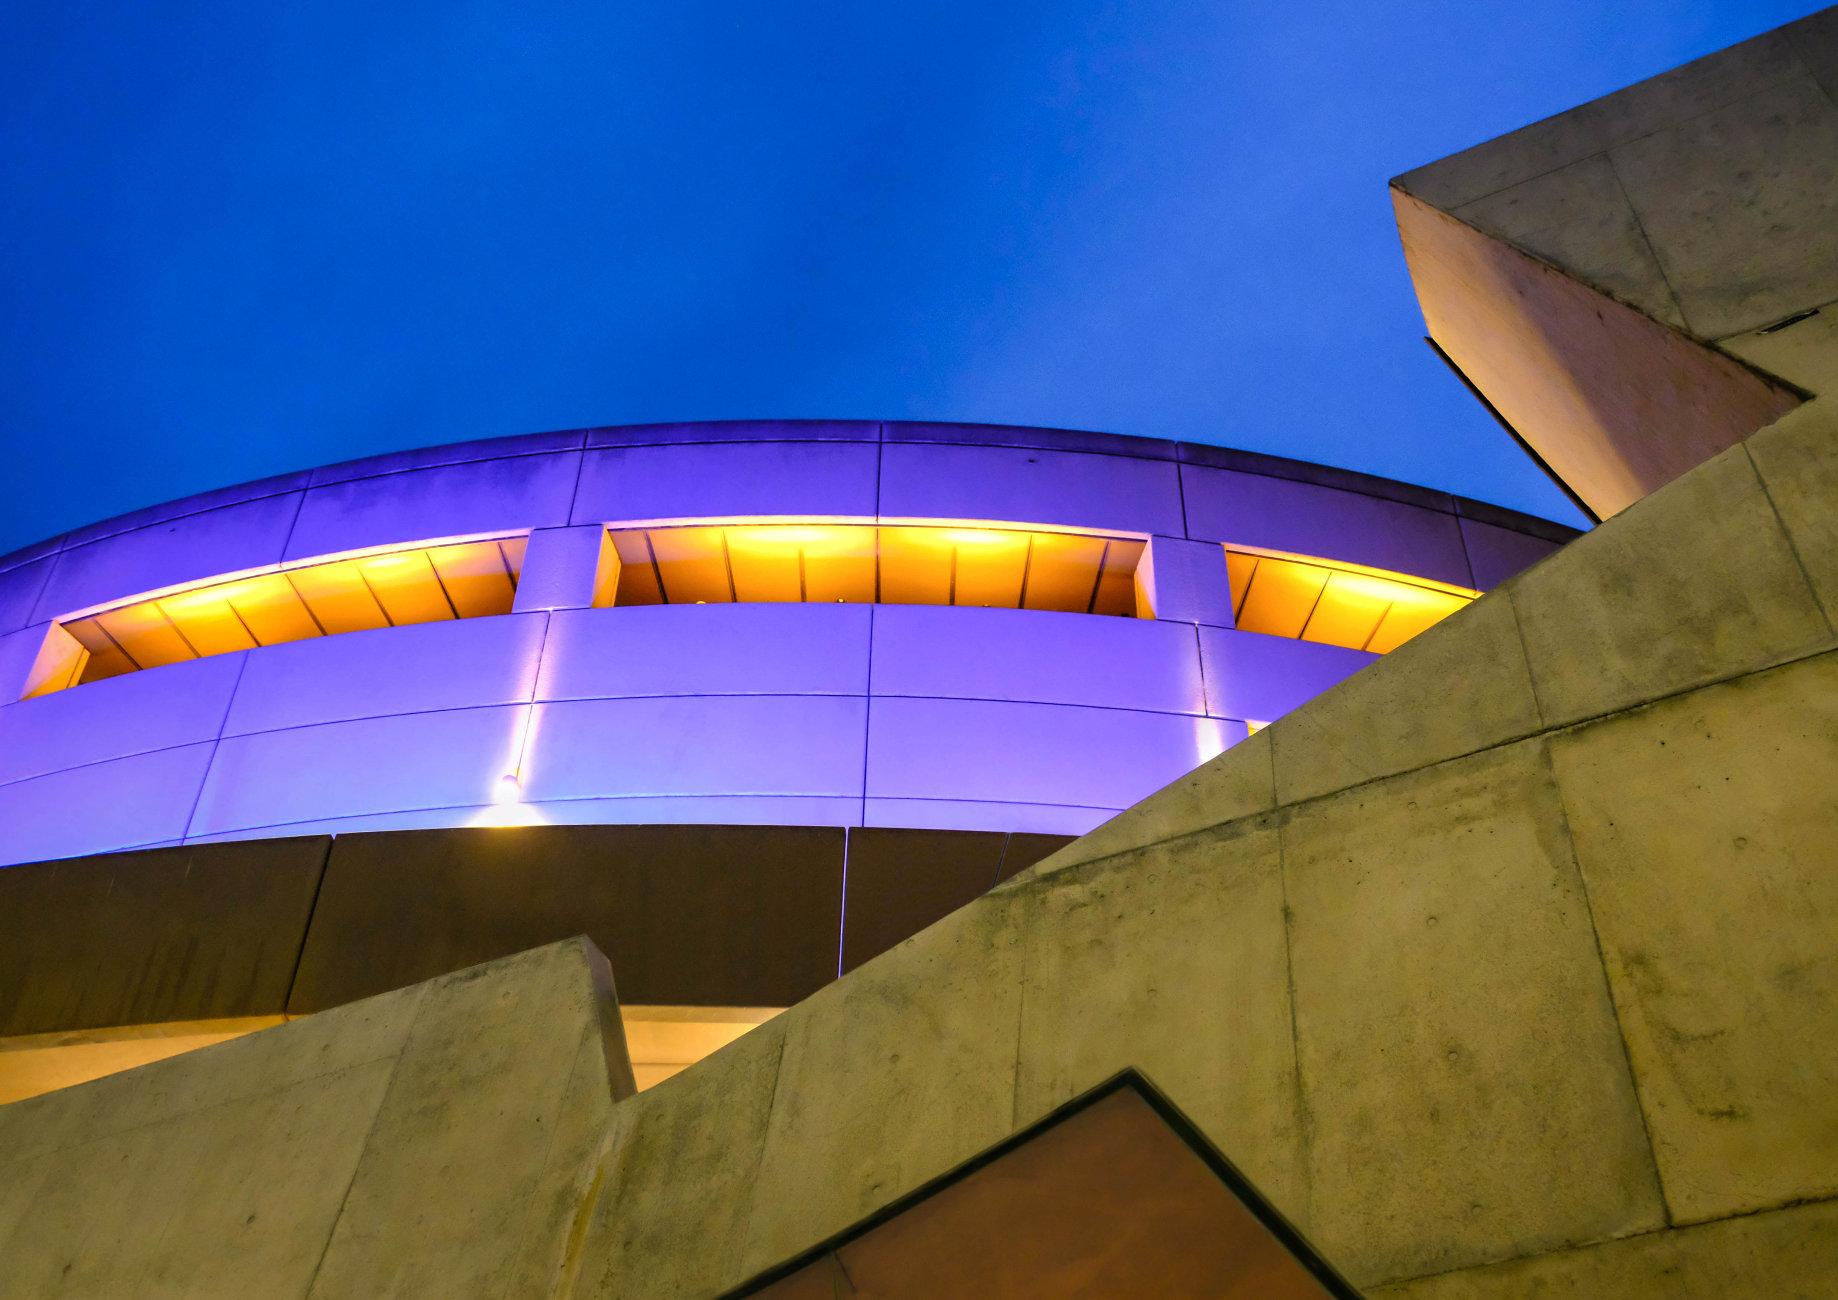 Arts Centre Reflection